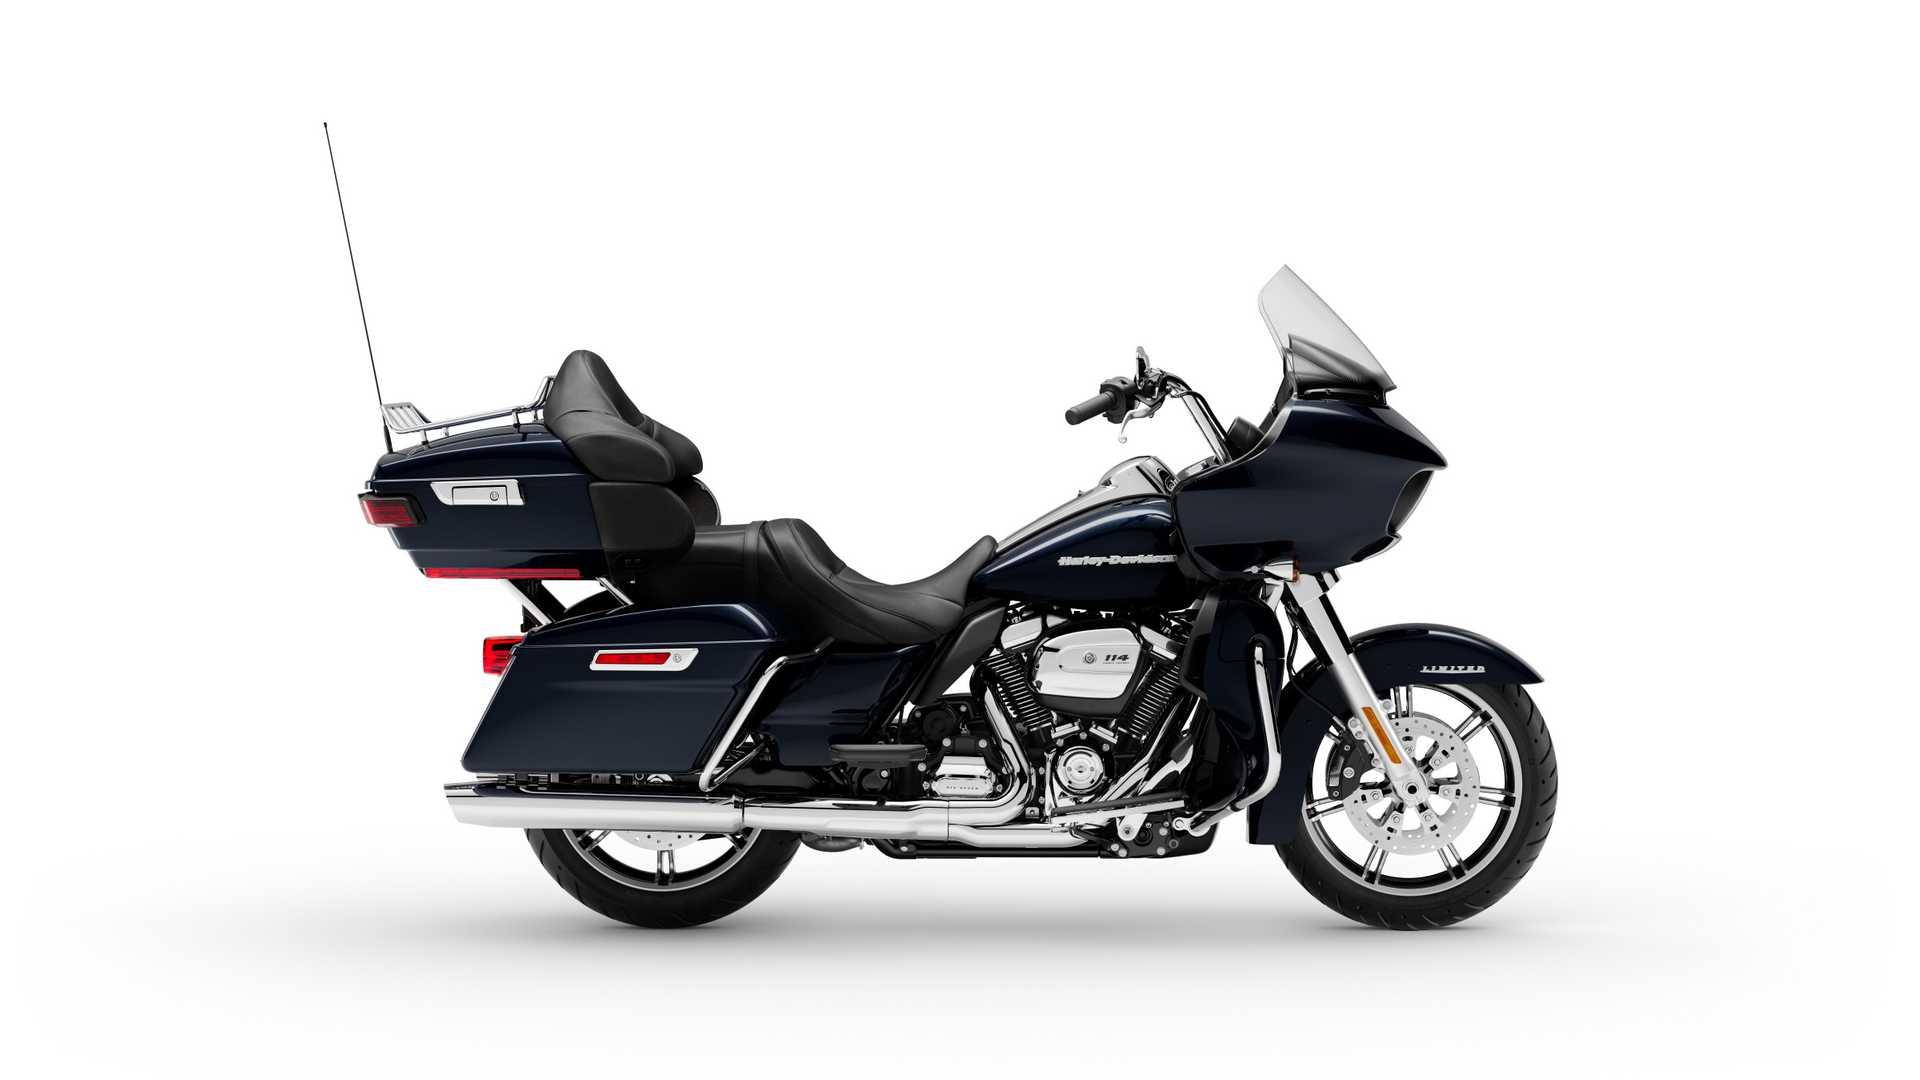 New Electronic Assistance for 2020 Harley-Davidson Models ...